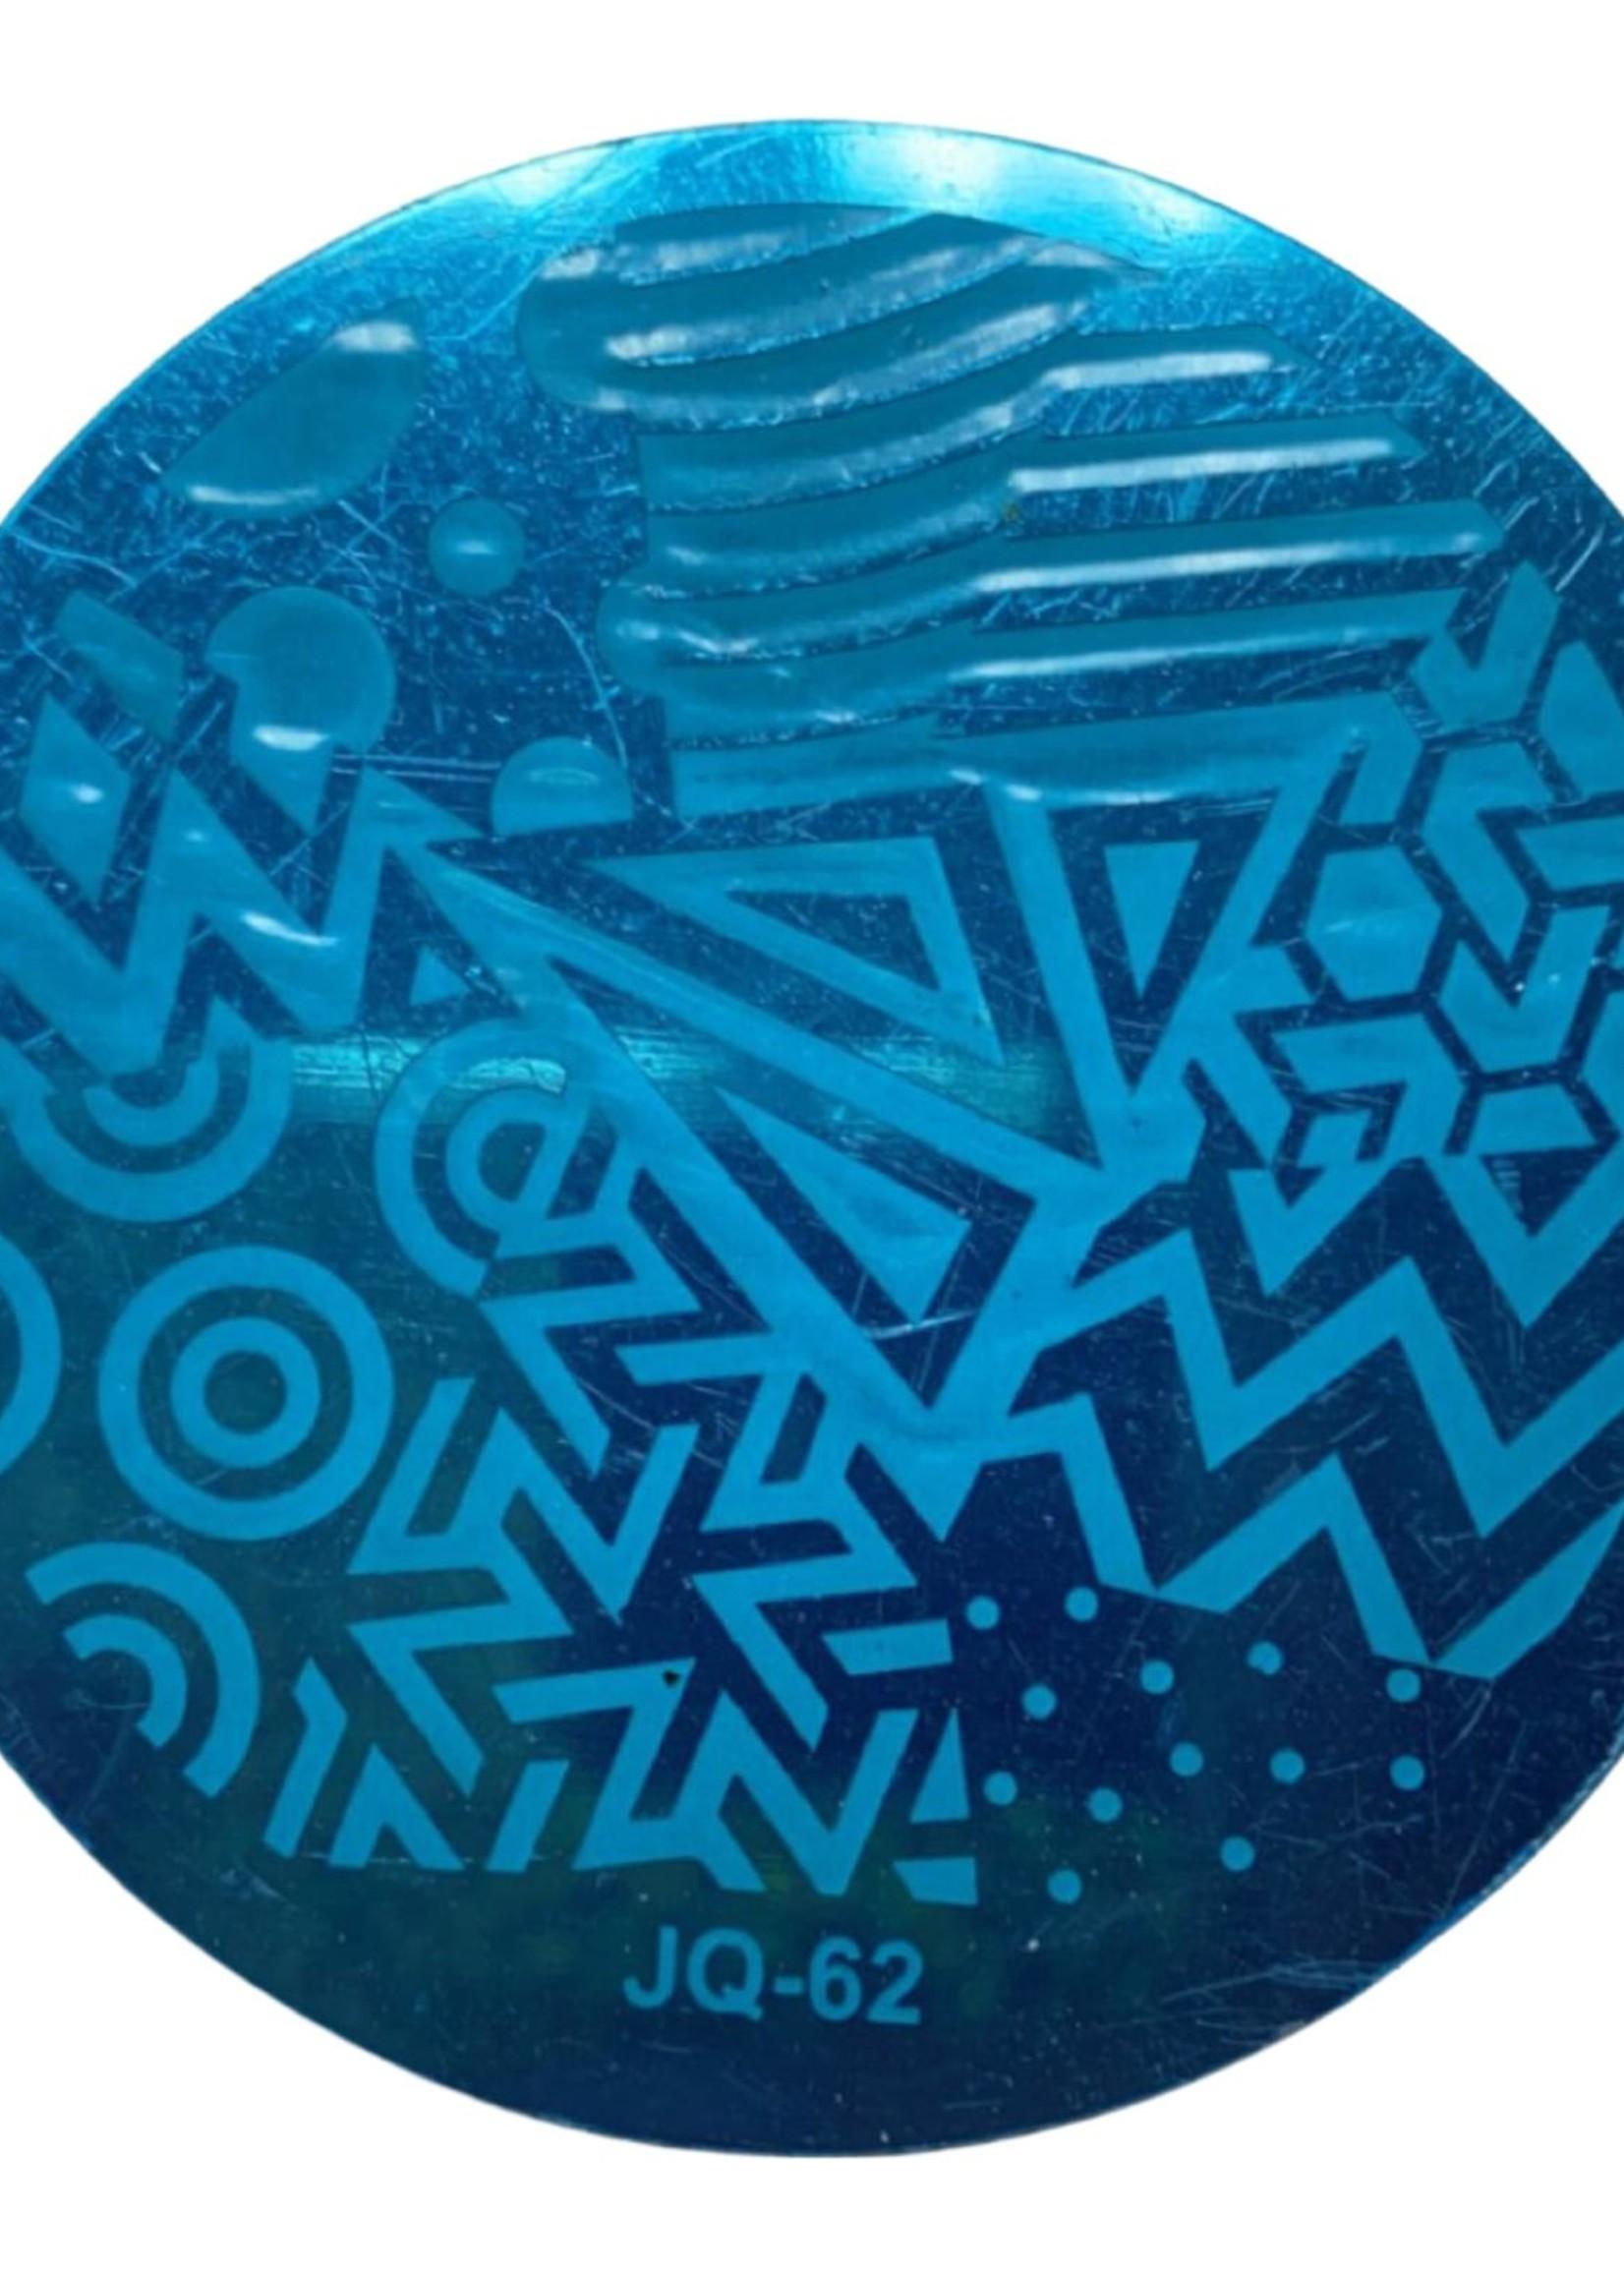 Stamp plate JQ-62